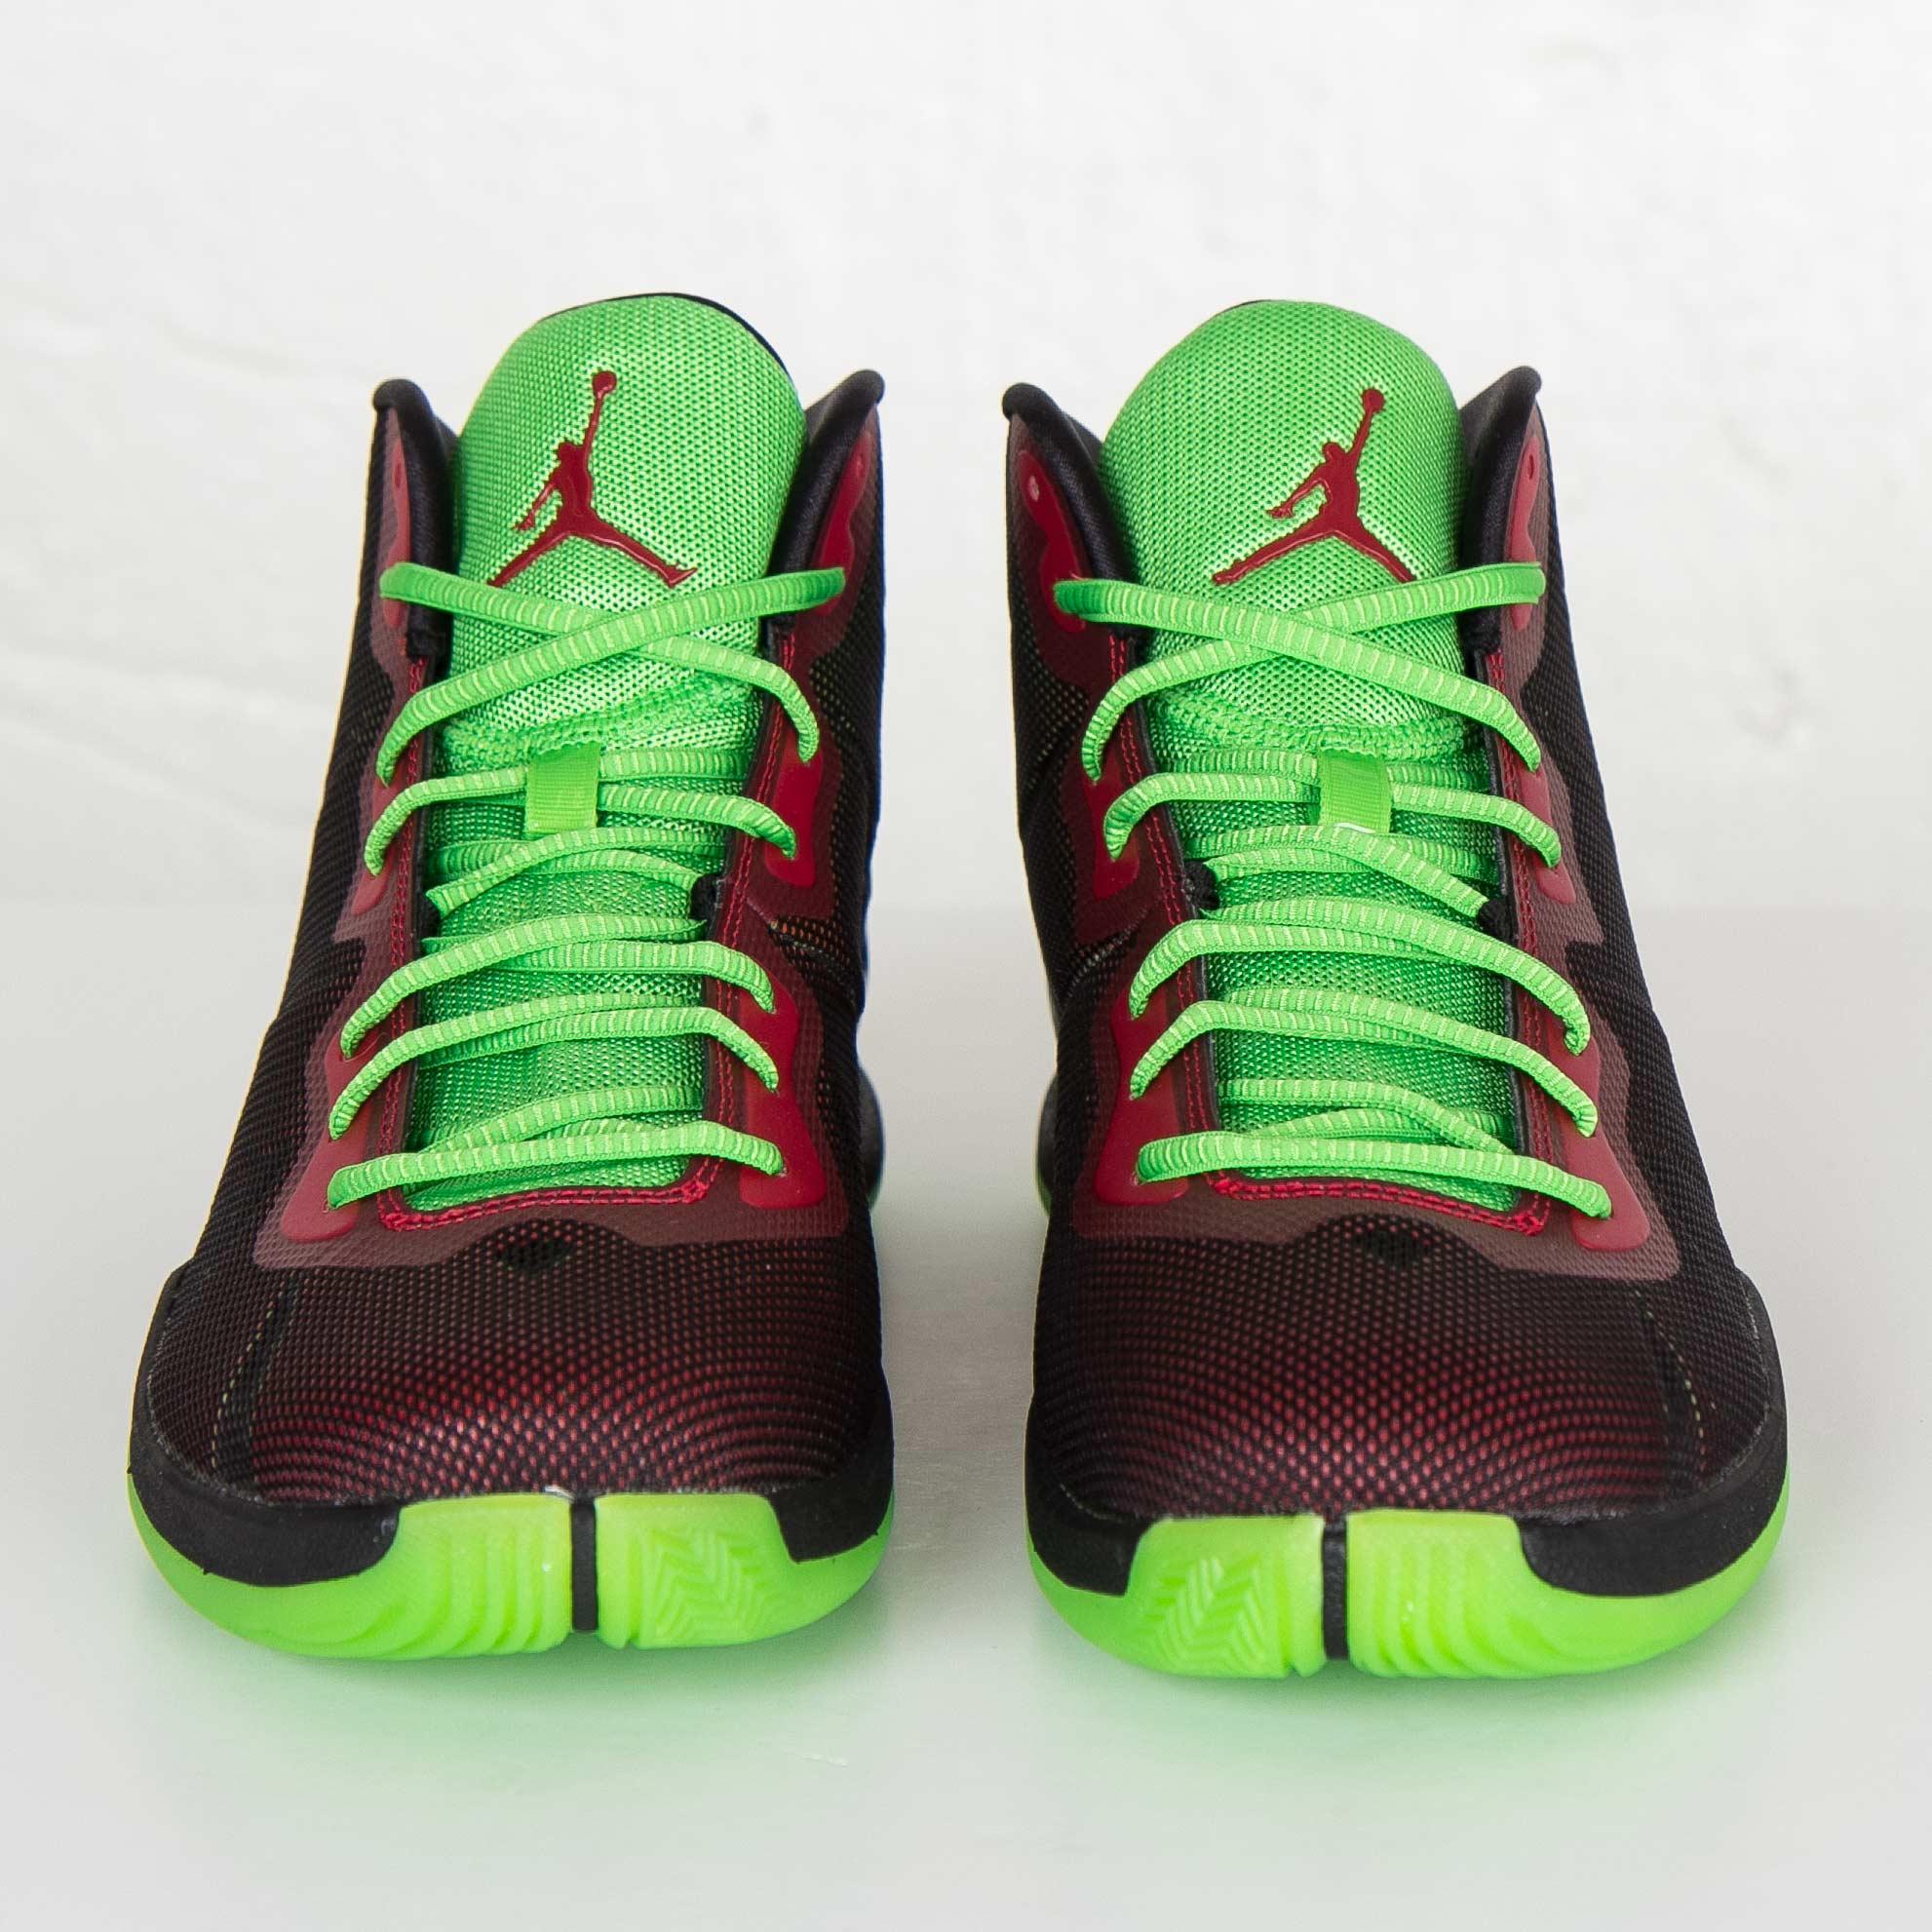 7817fc2c141868 Jordan Brand Jordan Superfly 4 - 768929-006 - Sneakersnstuff ...